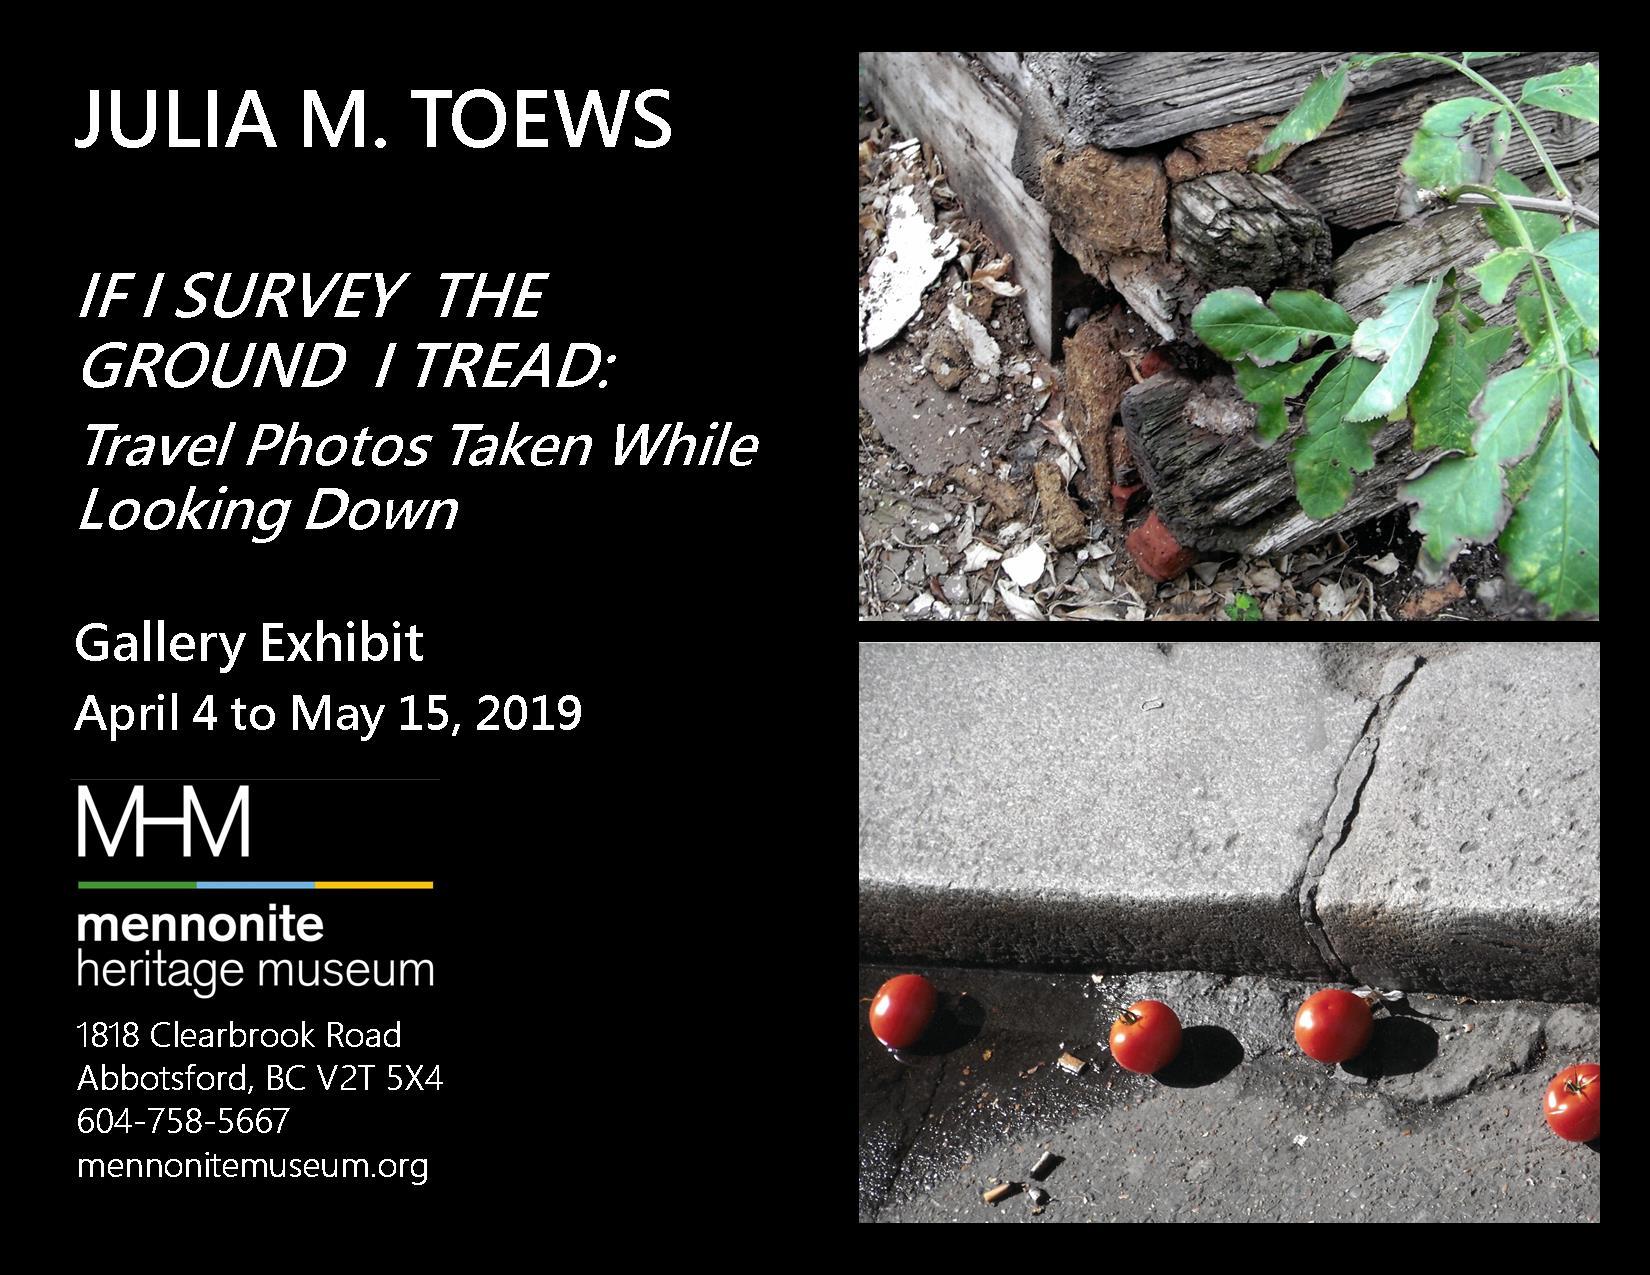 2019 04 MHM Gallery Exhibit Photo Exhibition Looking Down Julia M Toews